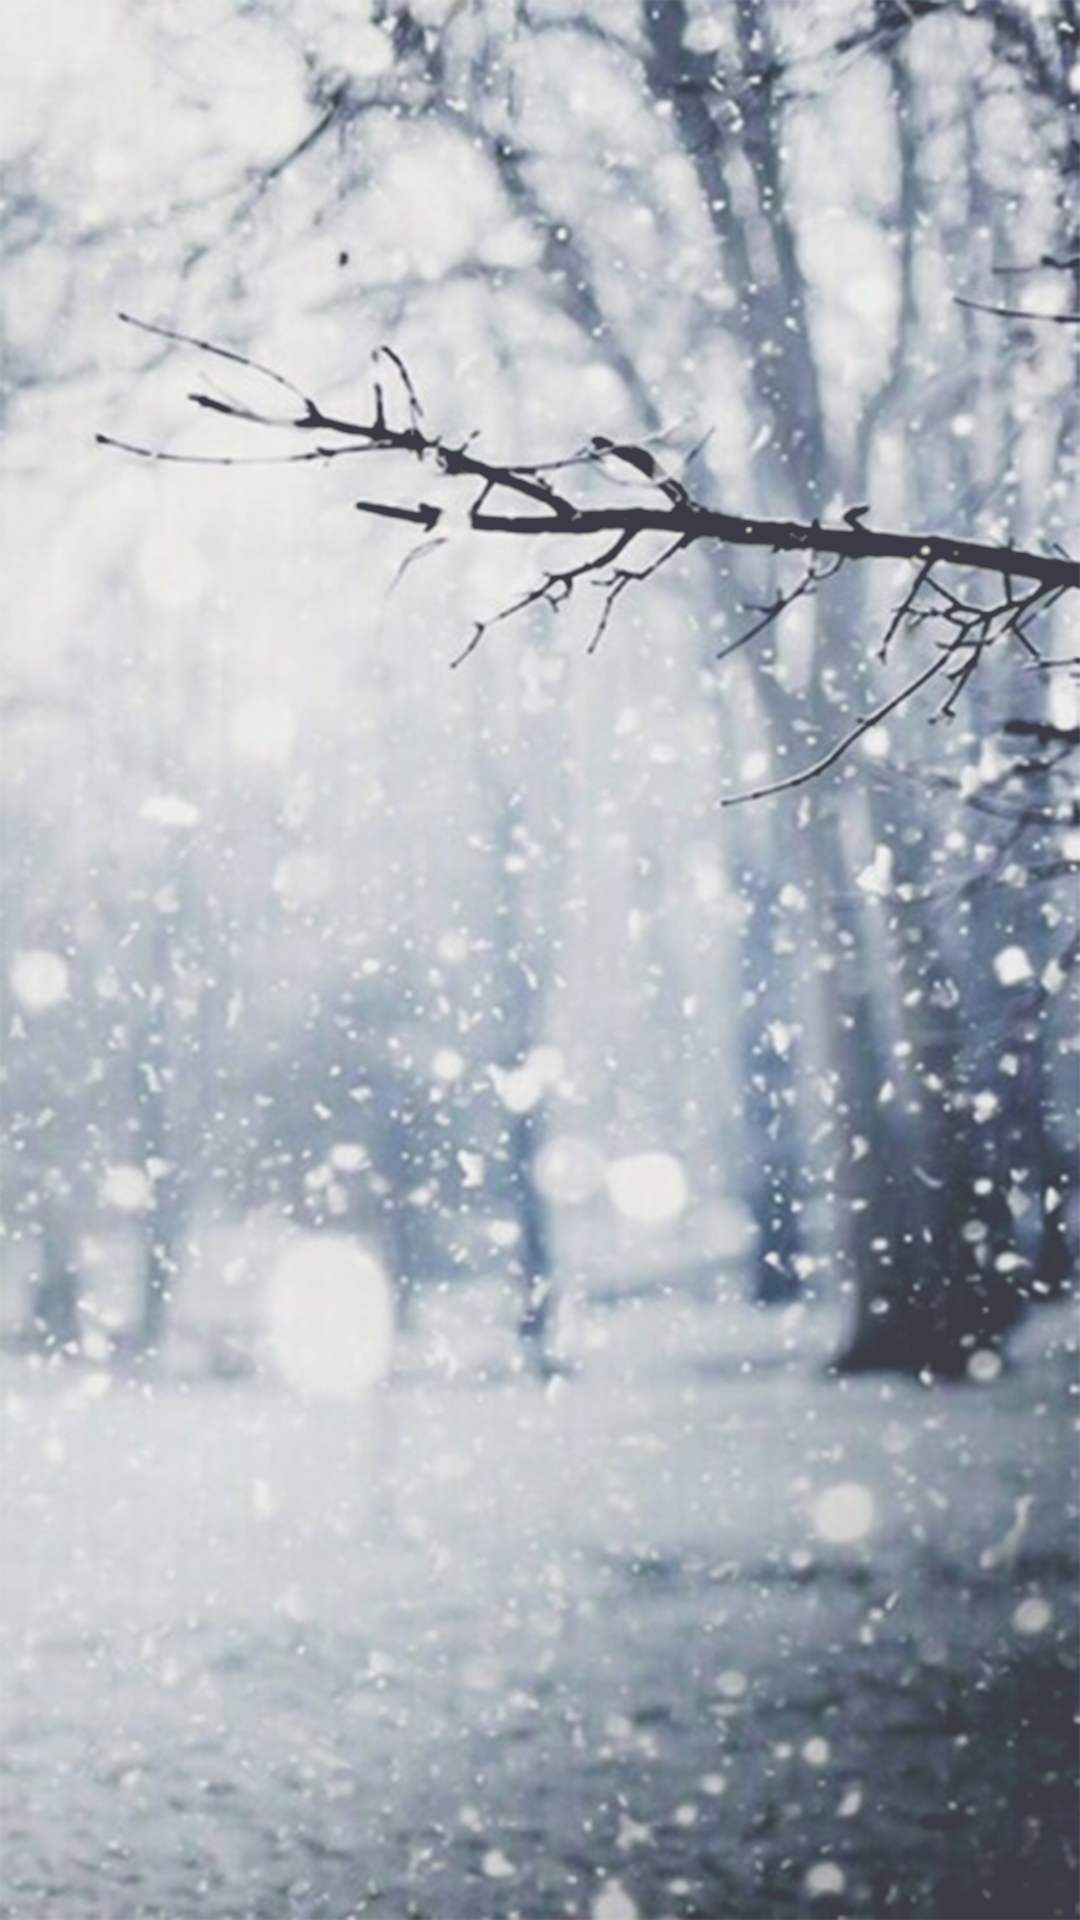 Iphone wallpaper tumblr snow - Christmas Wallpaper Tumblr